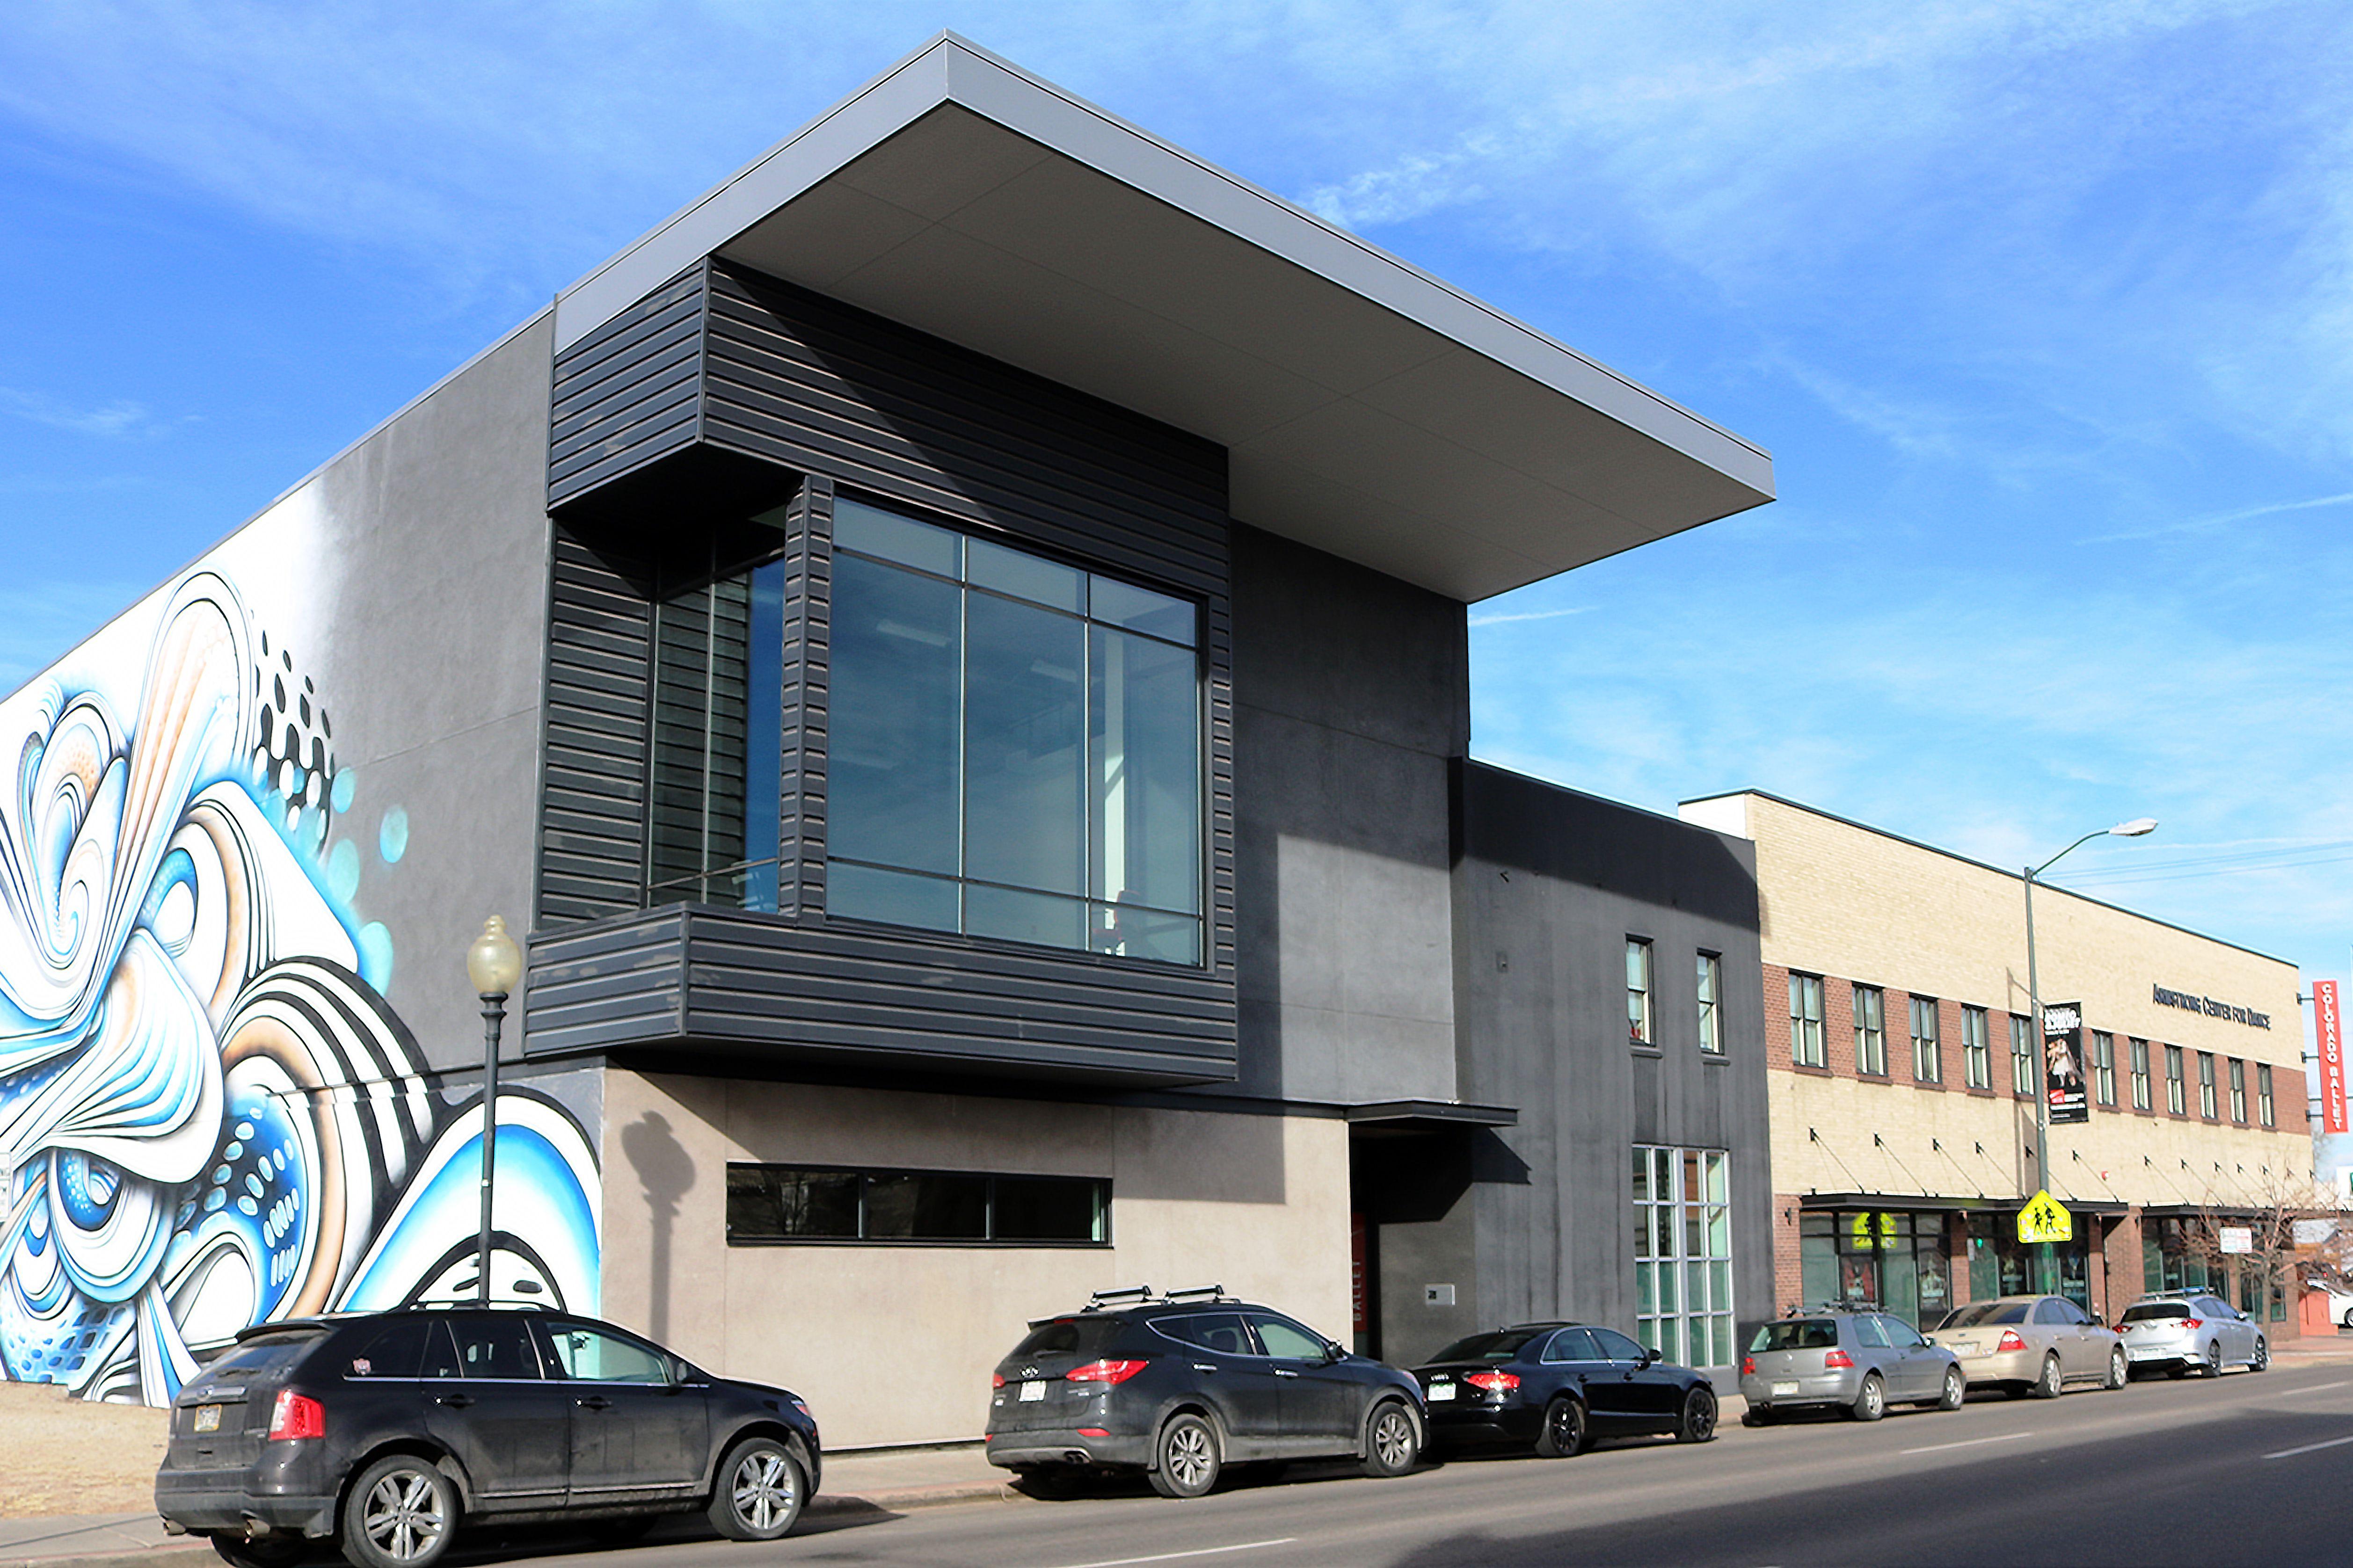 The Armstrong Center for Dance, home of the Colorado Ballet